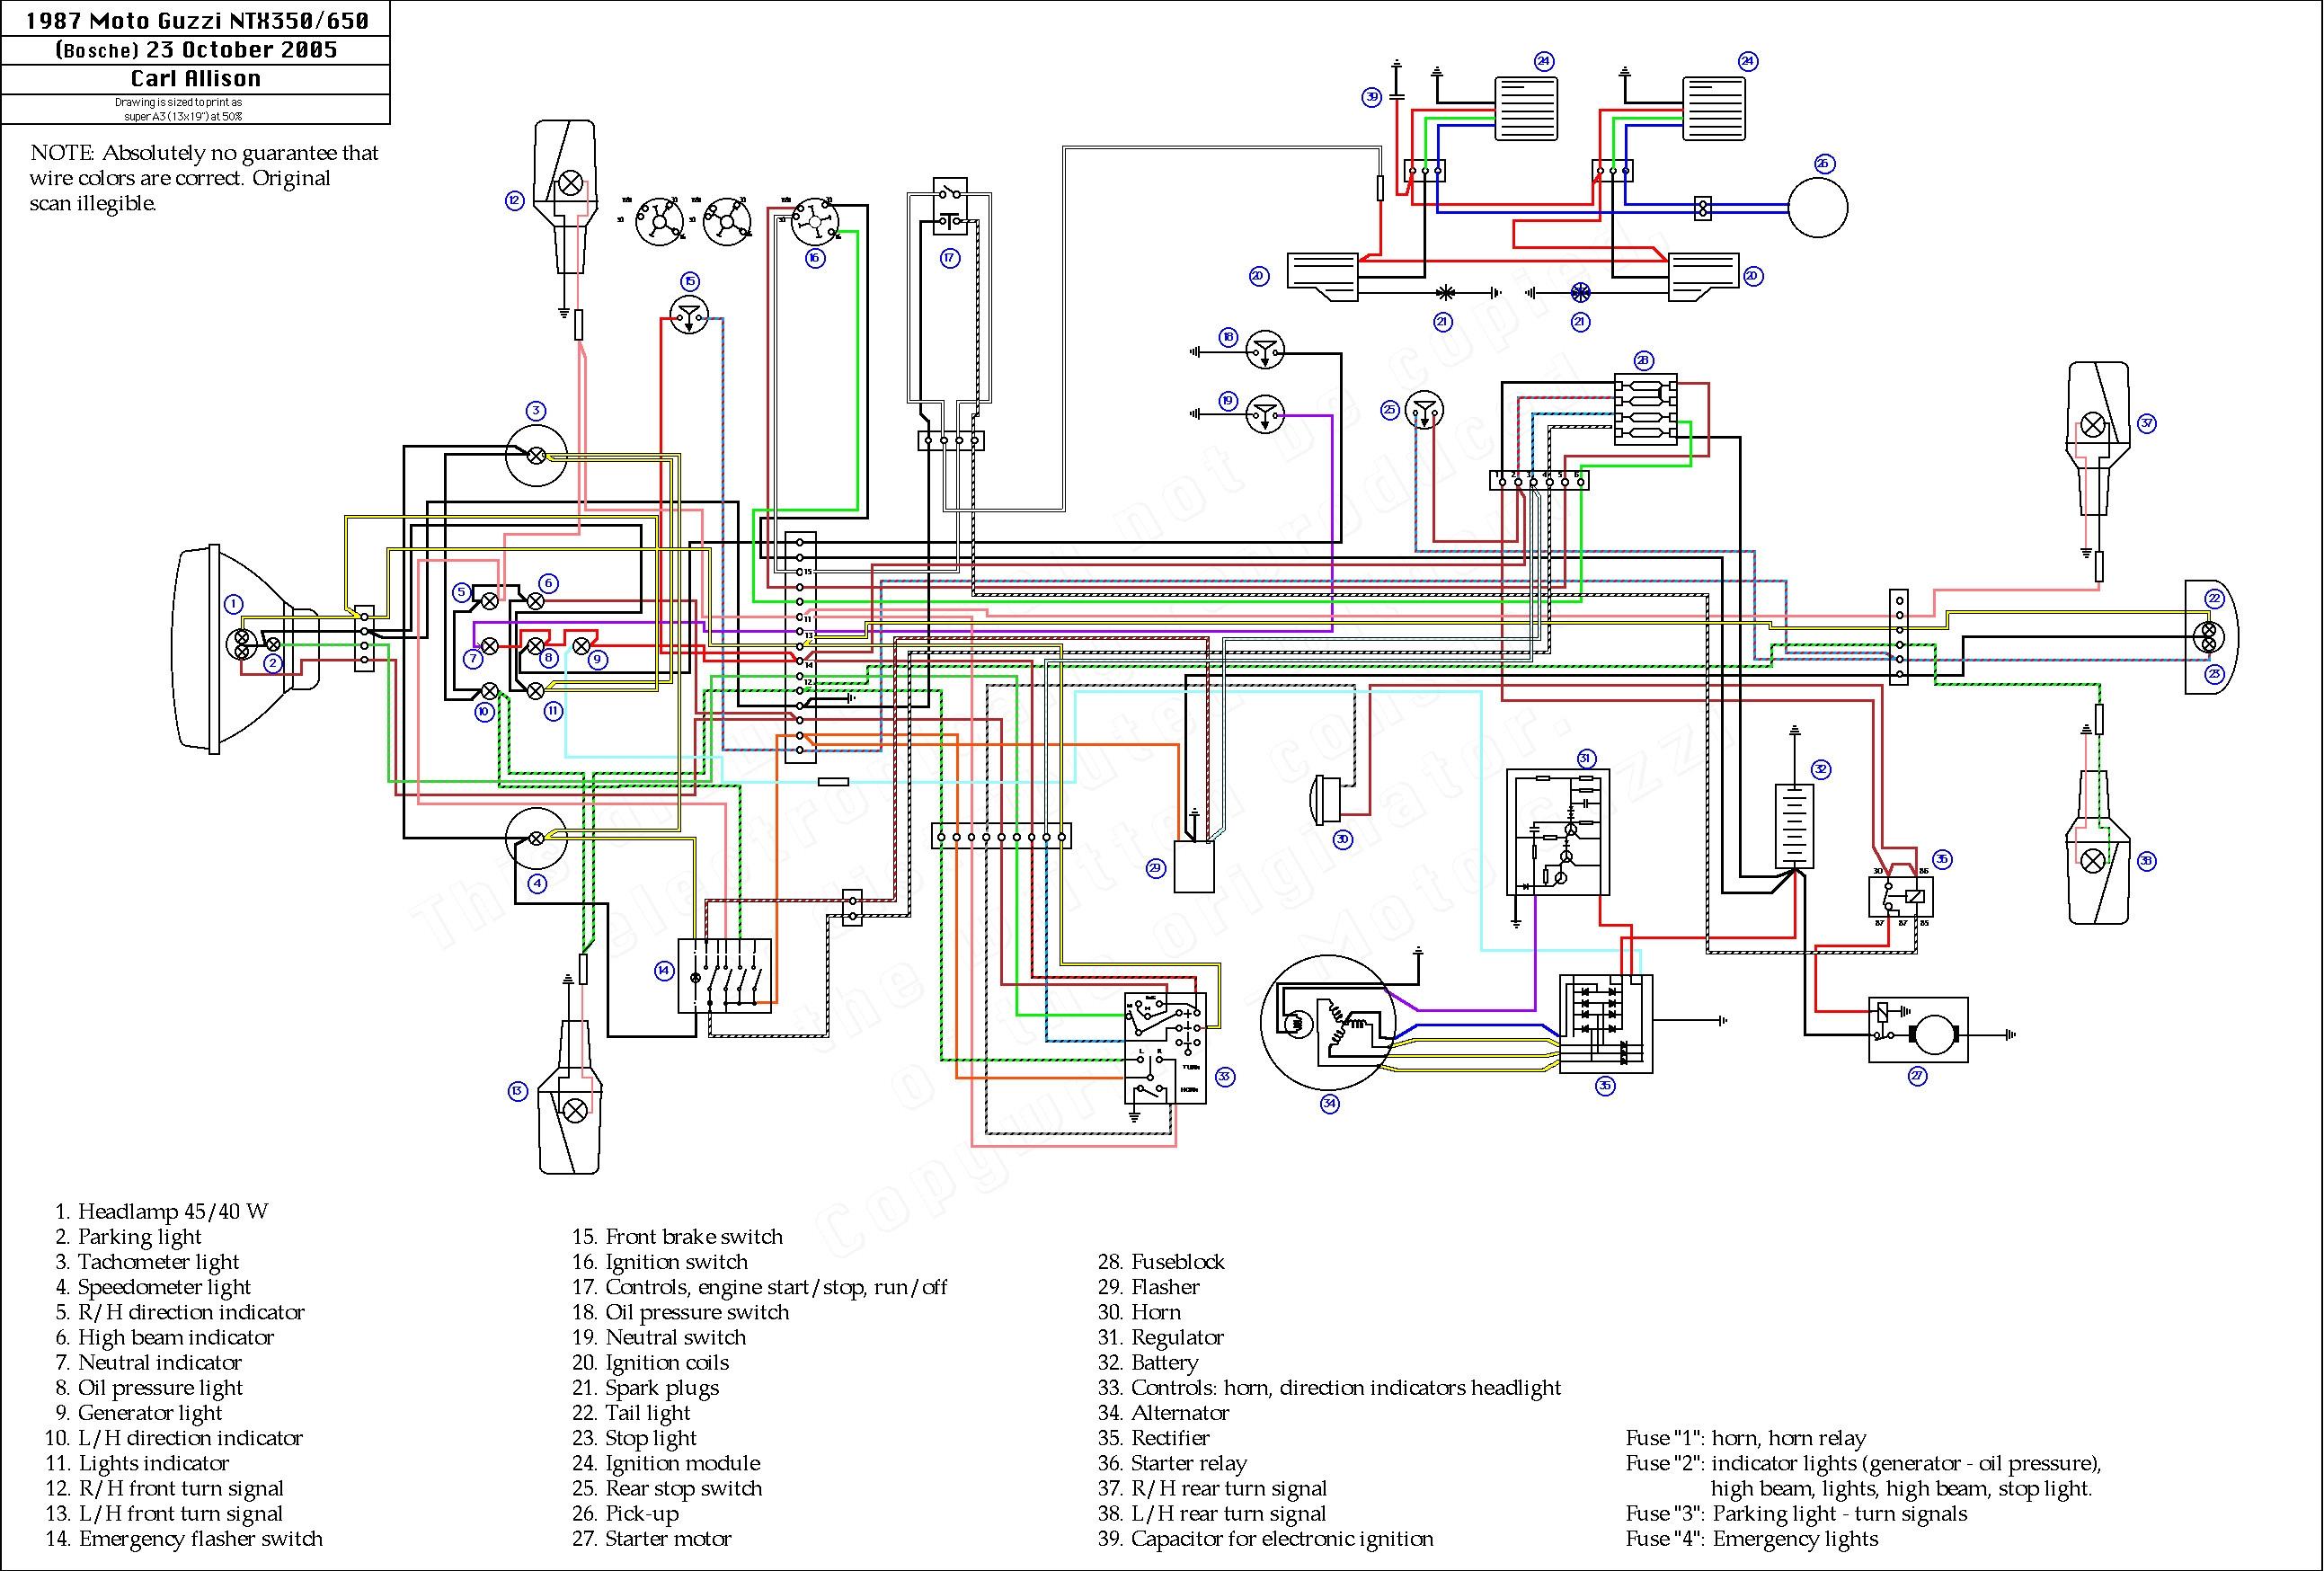 1987 Yamaha Warrior 350 Wiring Diagram - Wiring Diagram Direct pale-captain  - pale-captain.siciliabeb.it | 2003 Yamaha Warrior Wiring Diagrams |  | pale-captain.siciliabeb.it